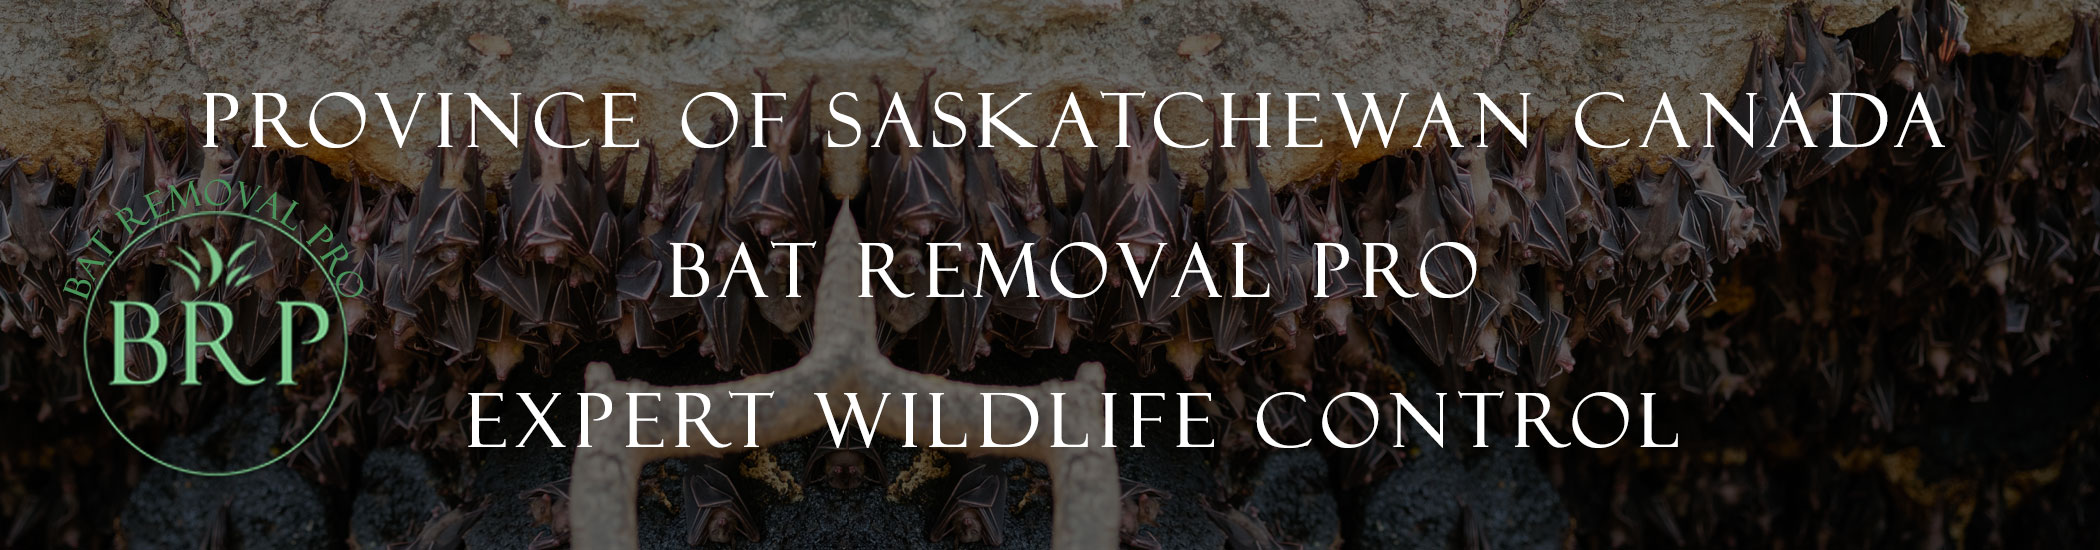 Saskatchewan_canada_image